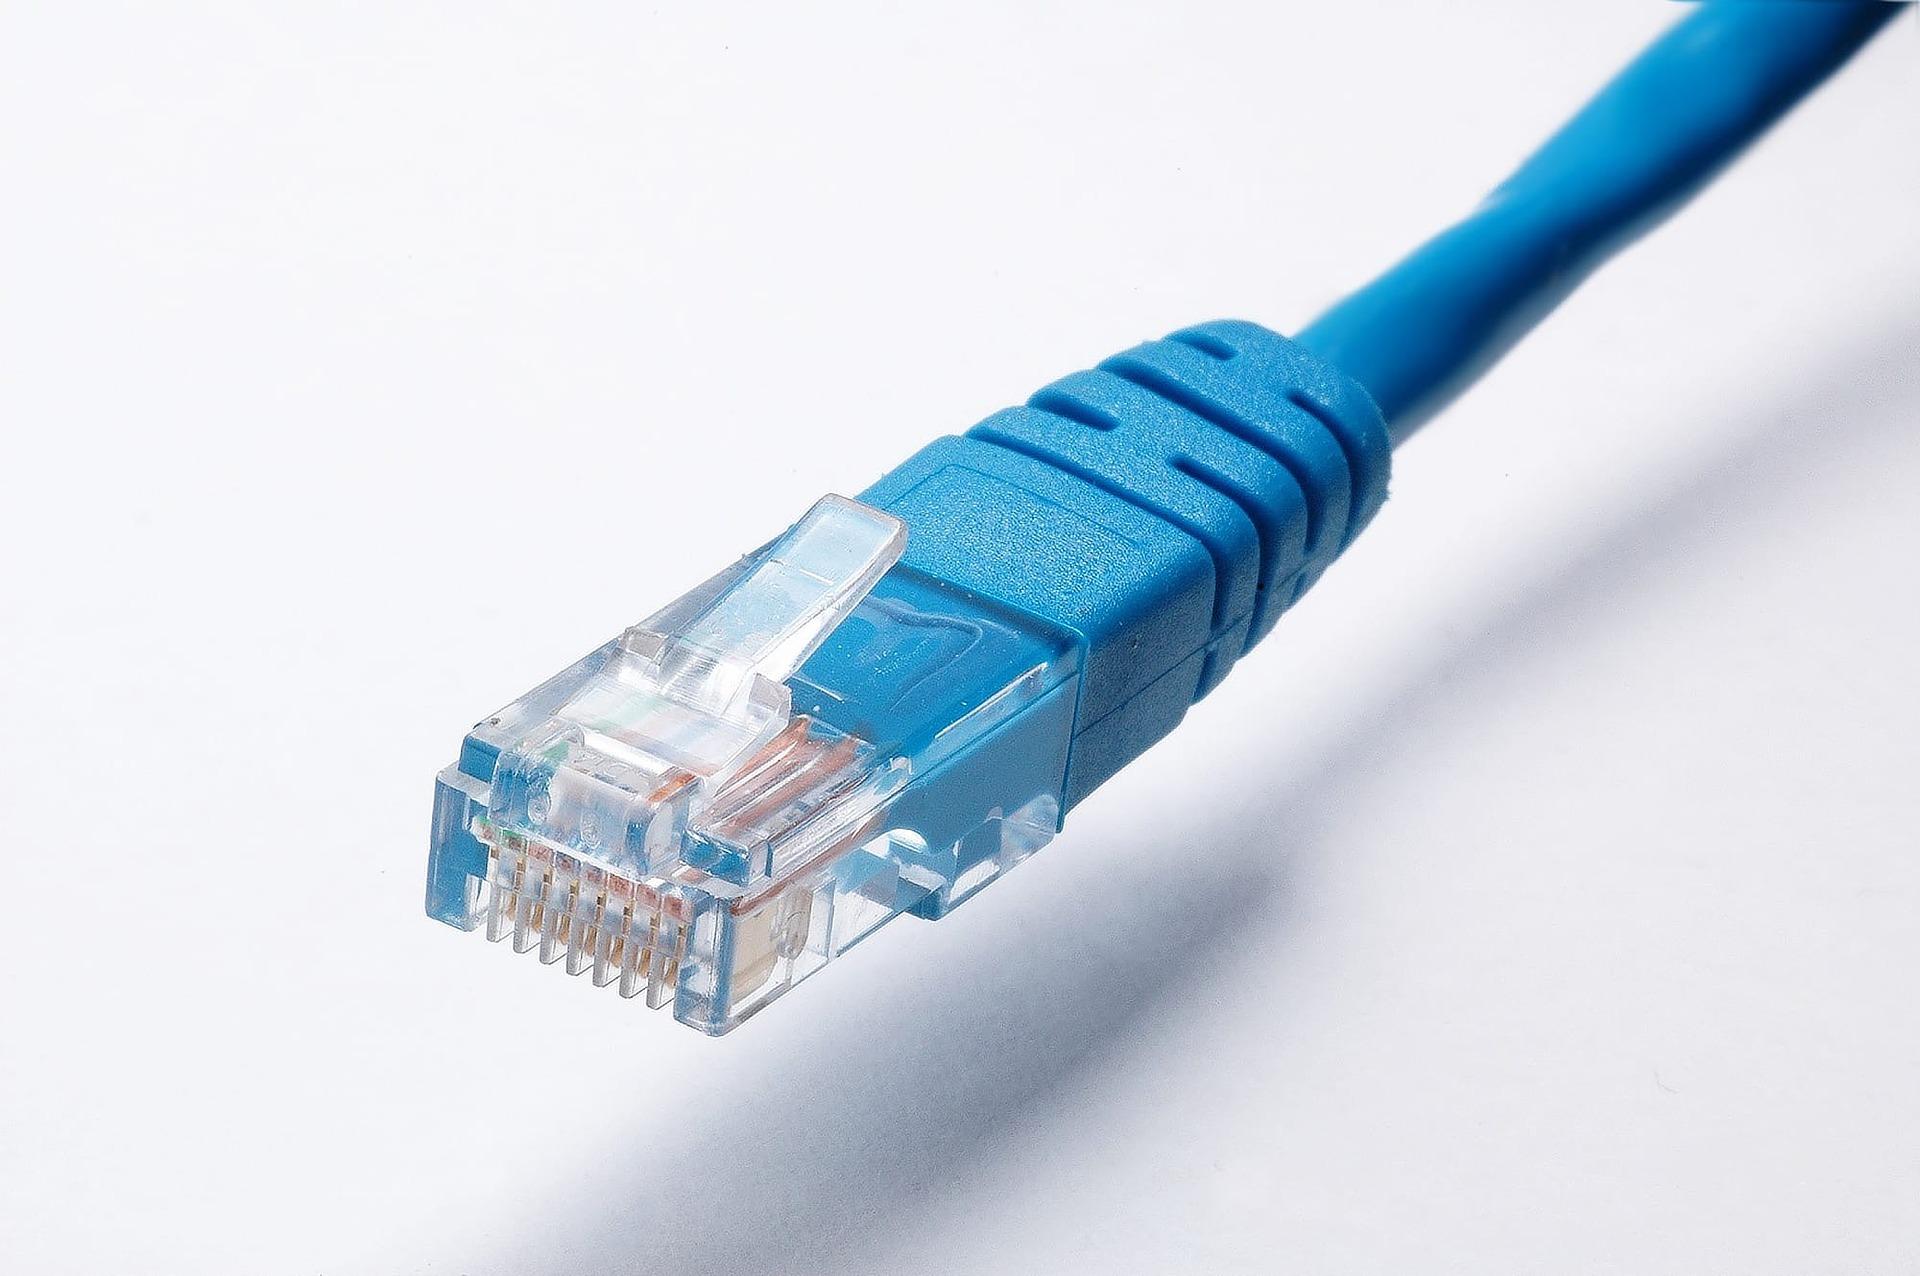 Standard-Vertragsklauseln EU Datenschutz, Symbolfoto: Adrian Malec via Pixabay